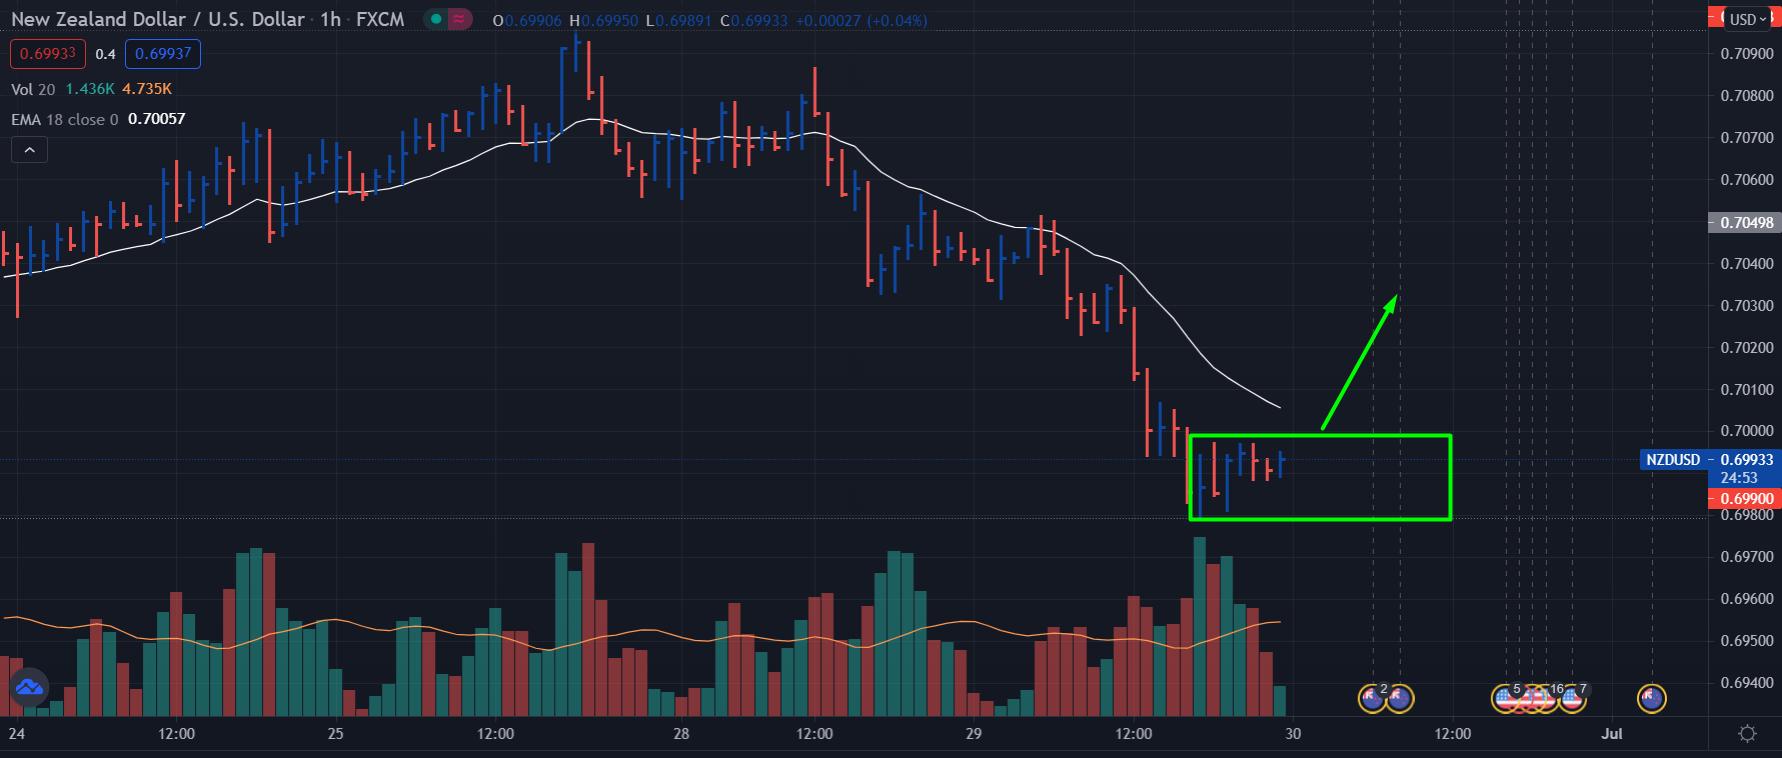 NZD/USD H1 vsa